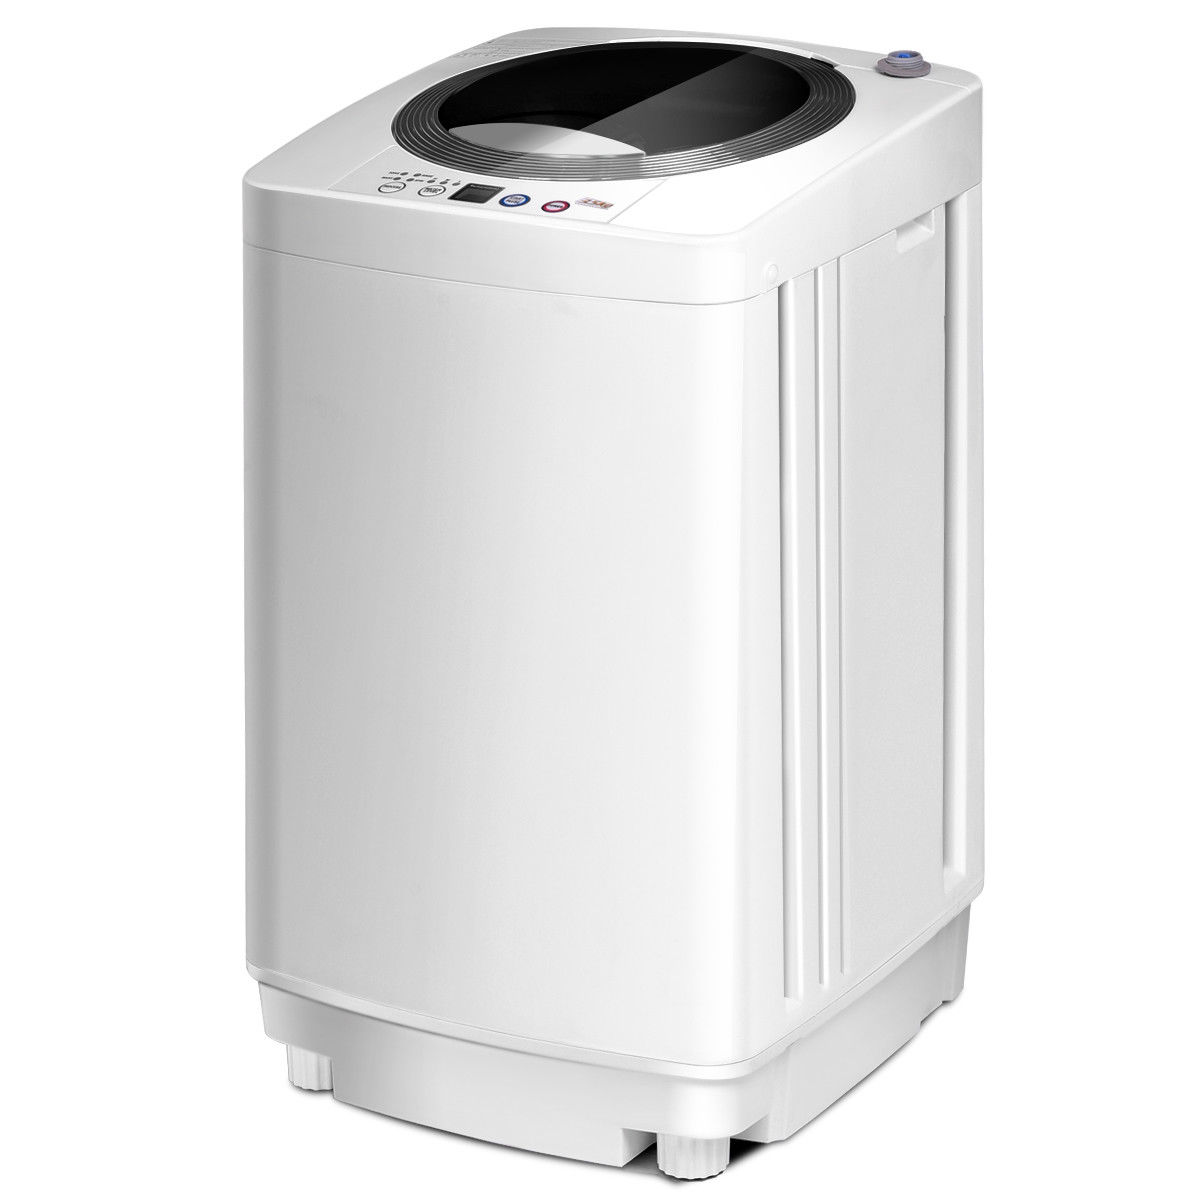 Washers Amp Dryers Walmart Canada